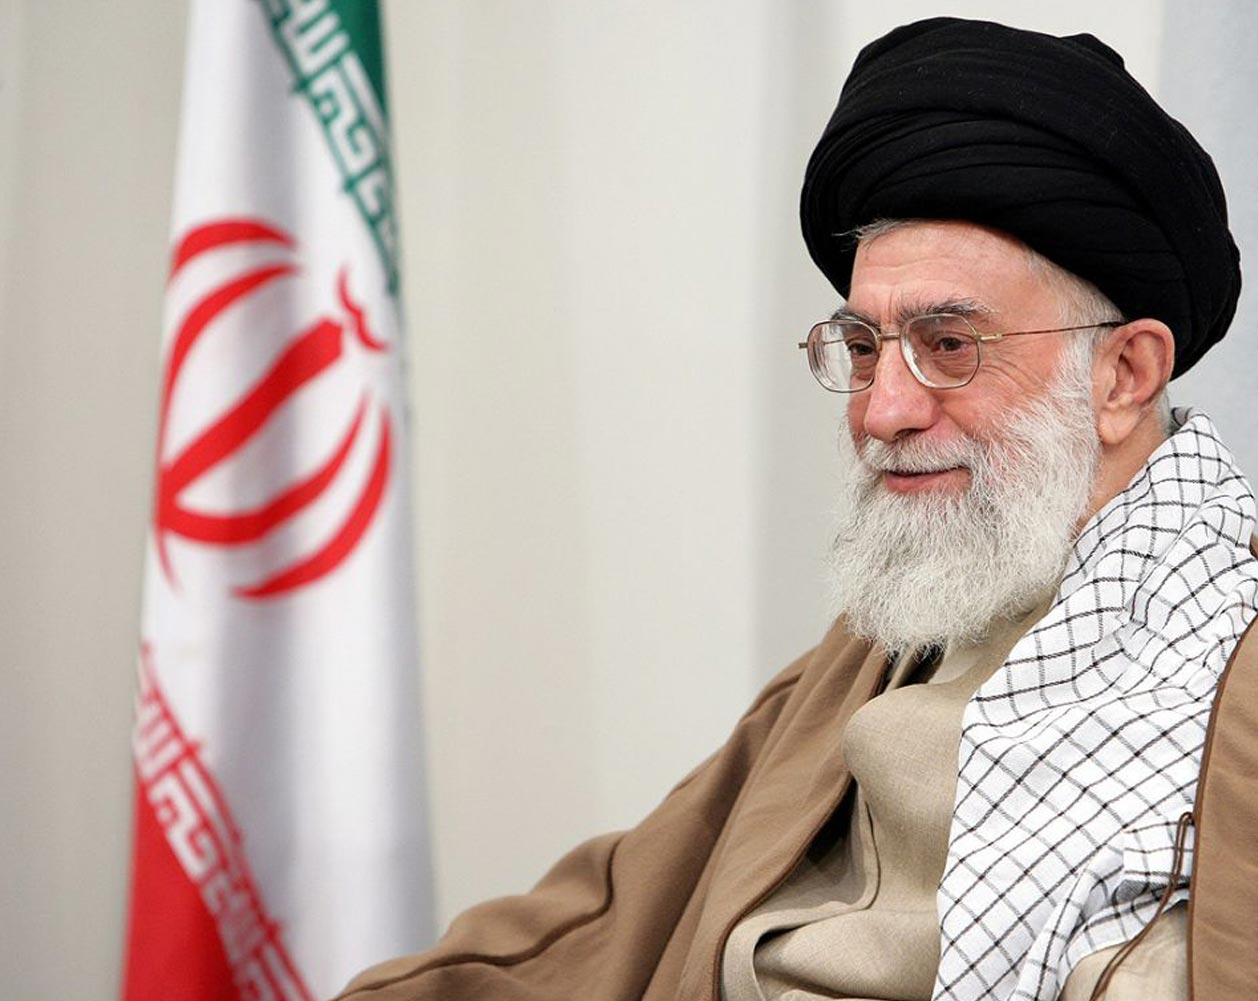 Iran: Mahmoud Vahidnia ospite in Italia, chiederò ad ambasciatore iraniano - AUDIO